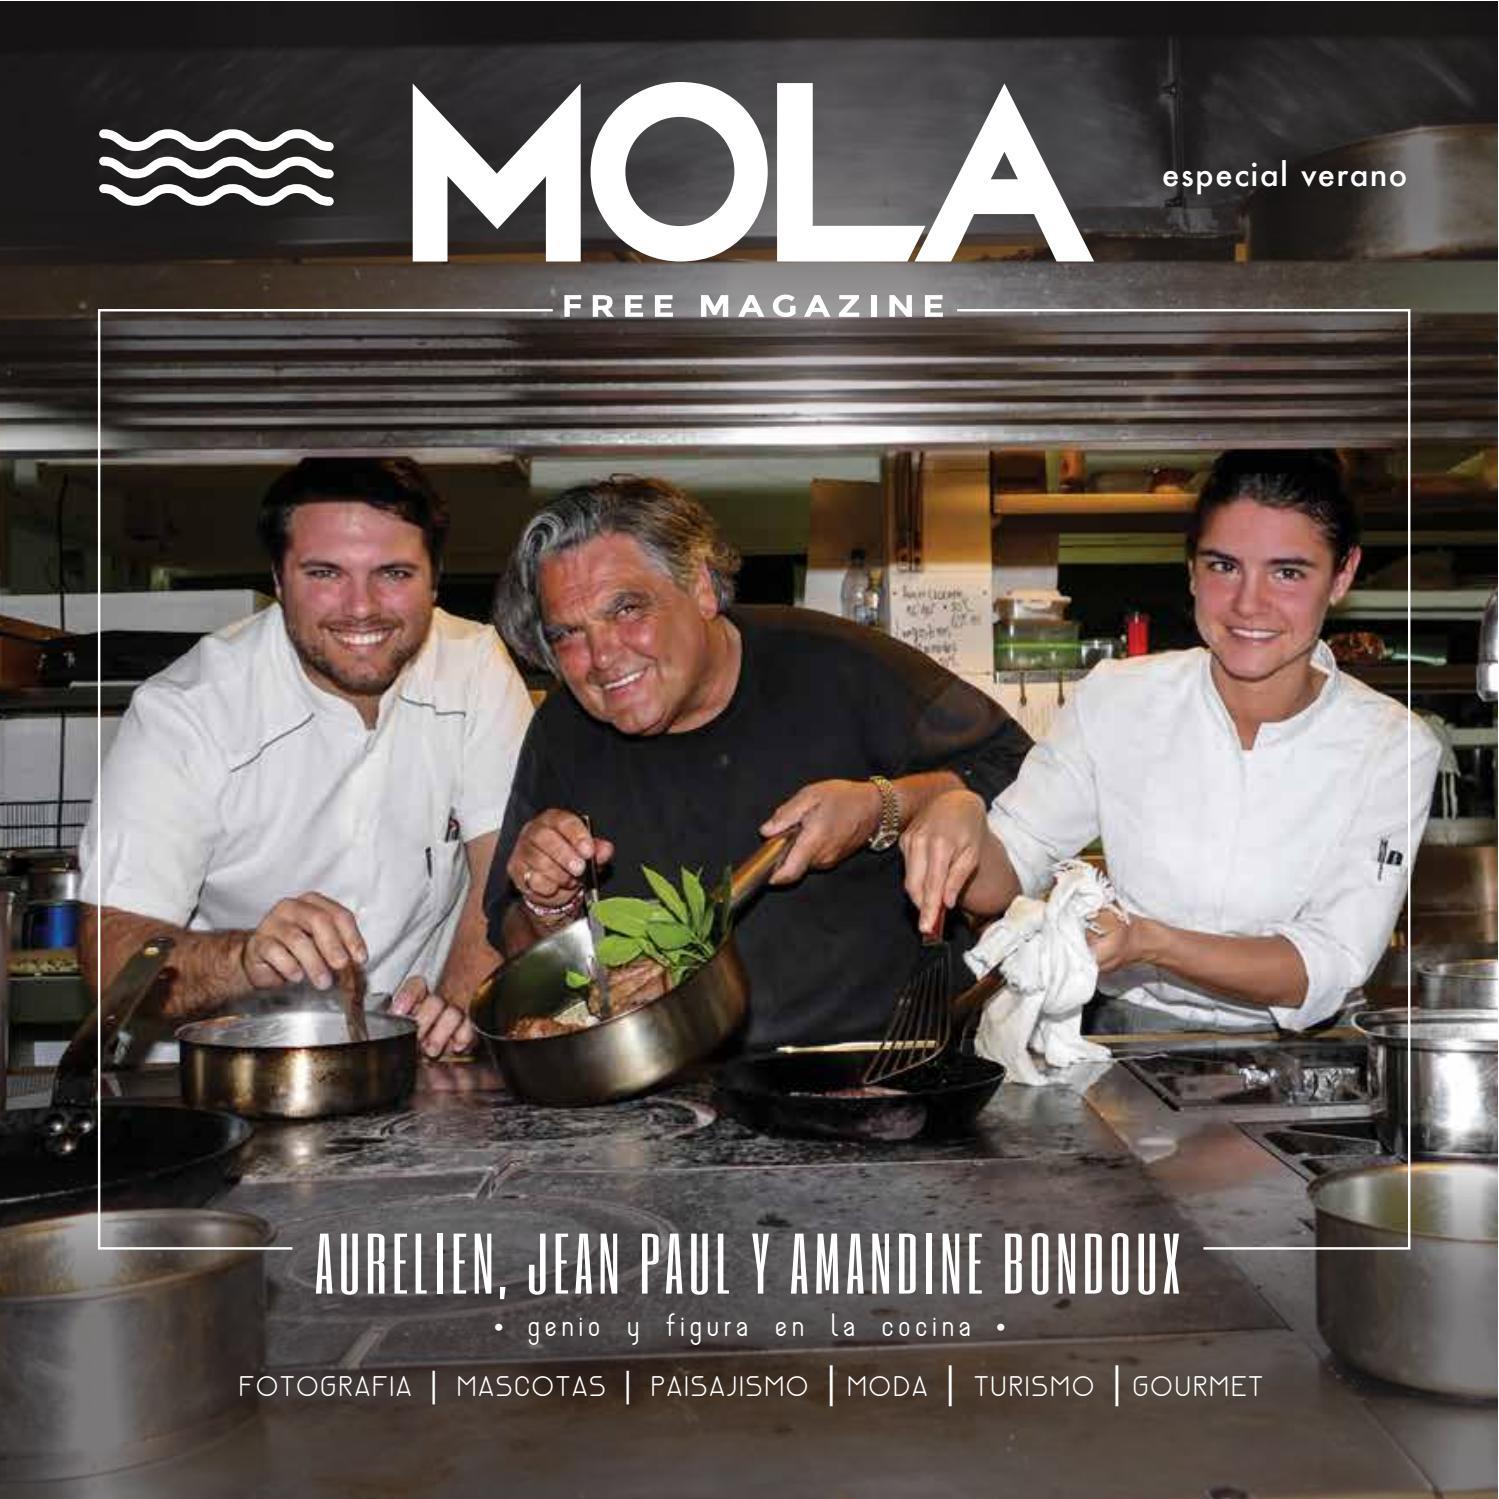 MOLA #4 * Especial Verano * by MOLA free magazine - issuu